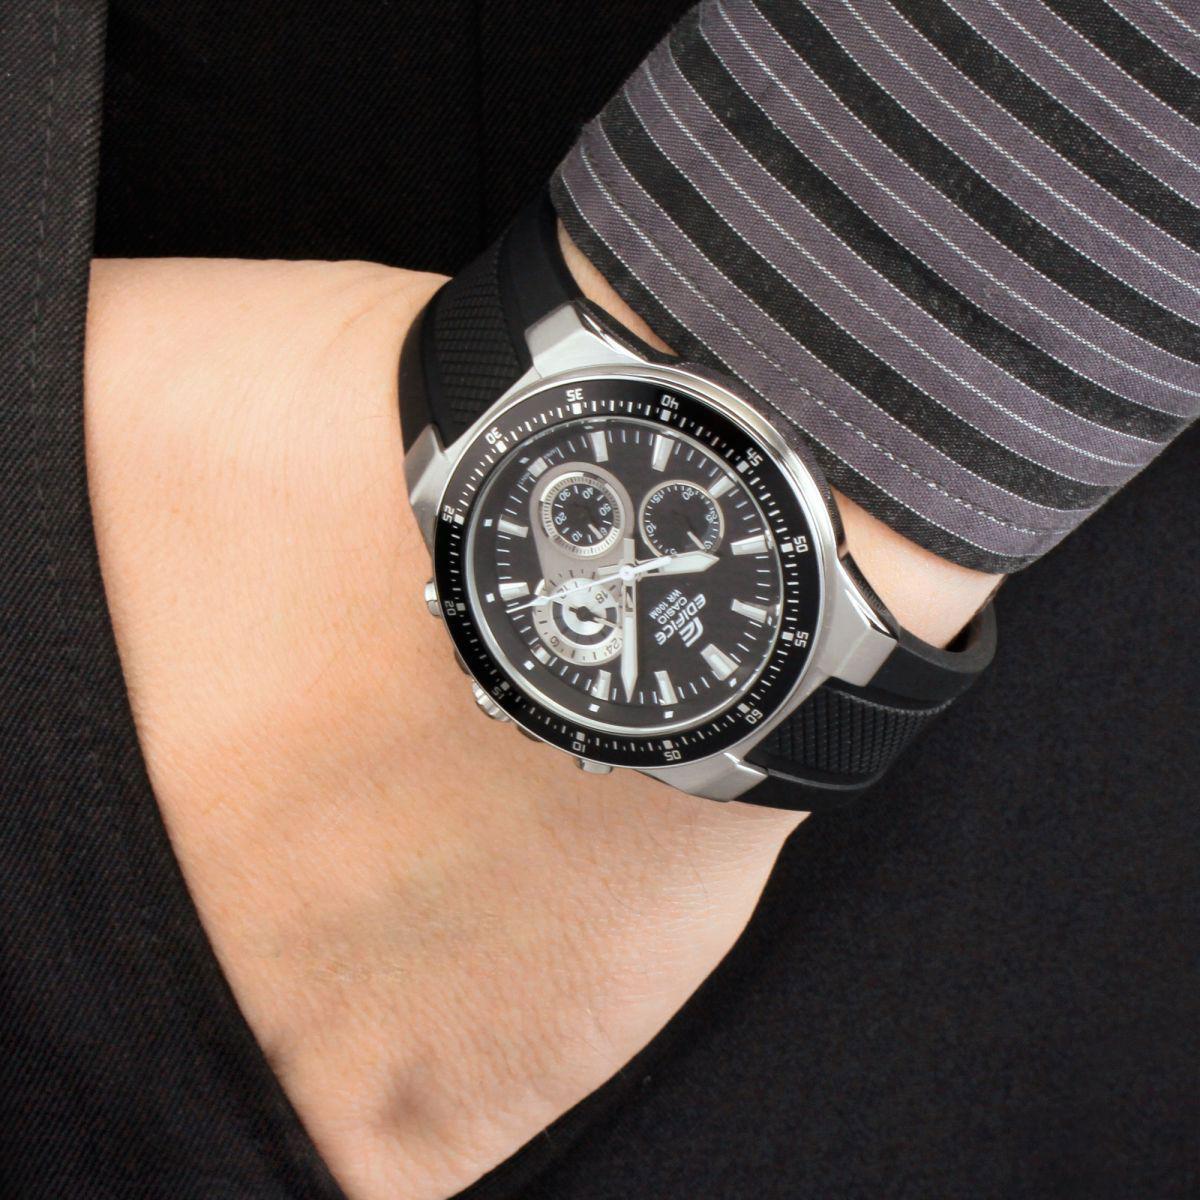 Casio EF-552-1A - купить наручные часы Casio Edifice EF-552-1A   EF ... a44e0d34d75